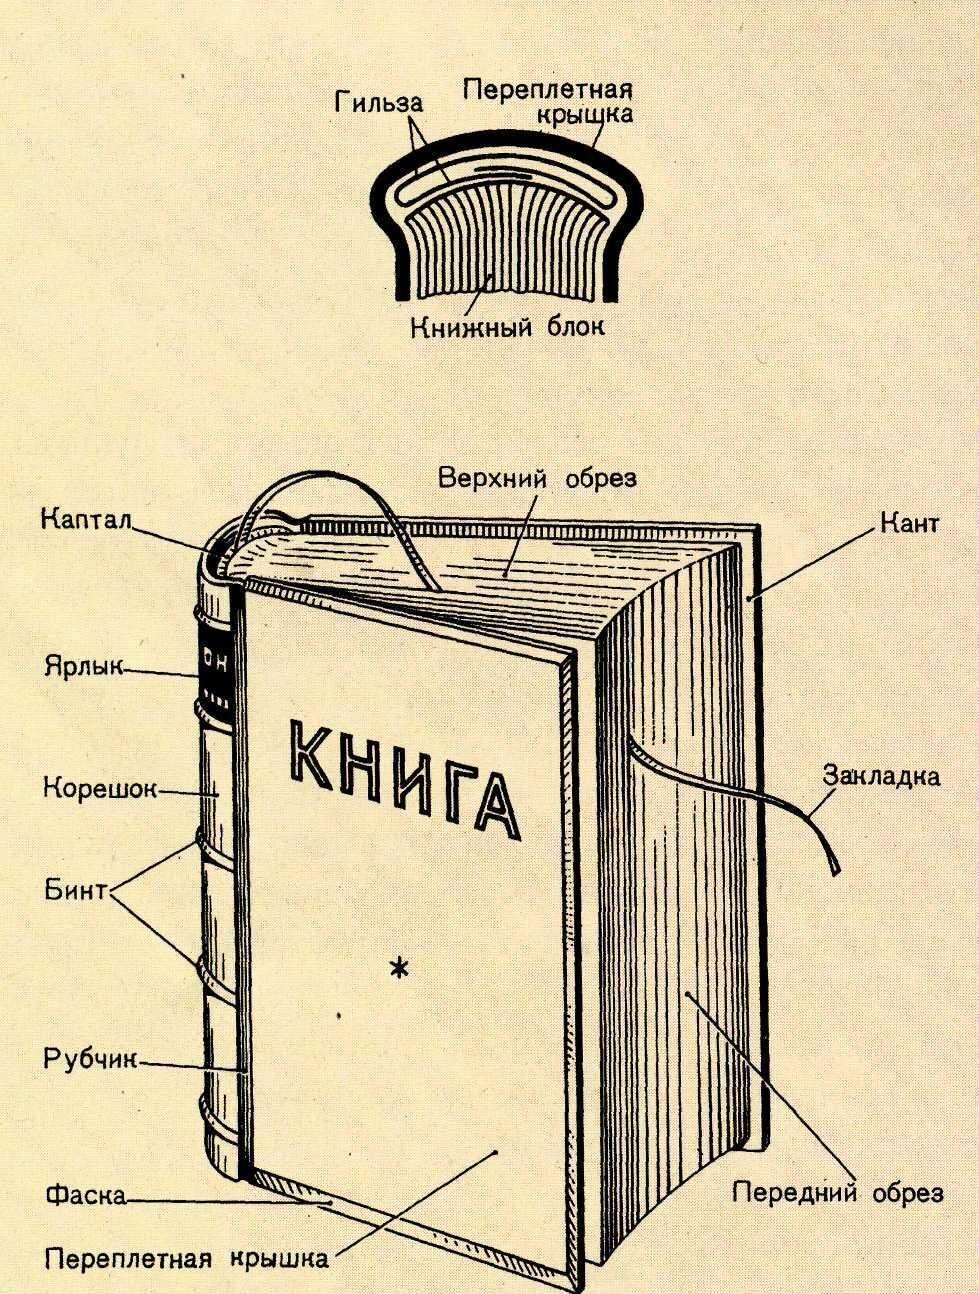 Схема своими руками книги